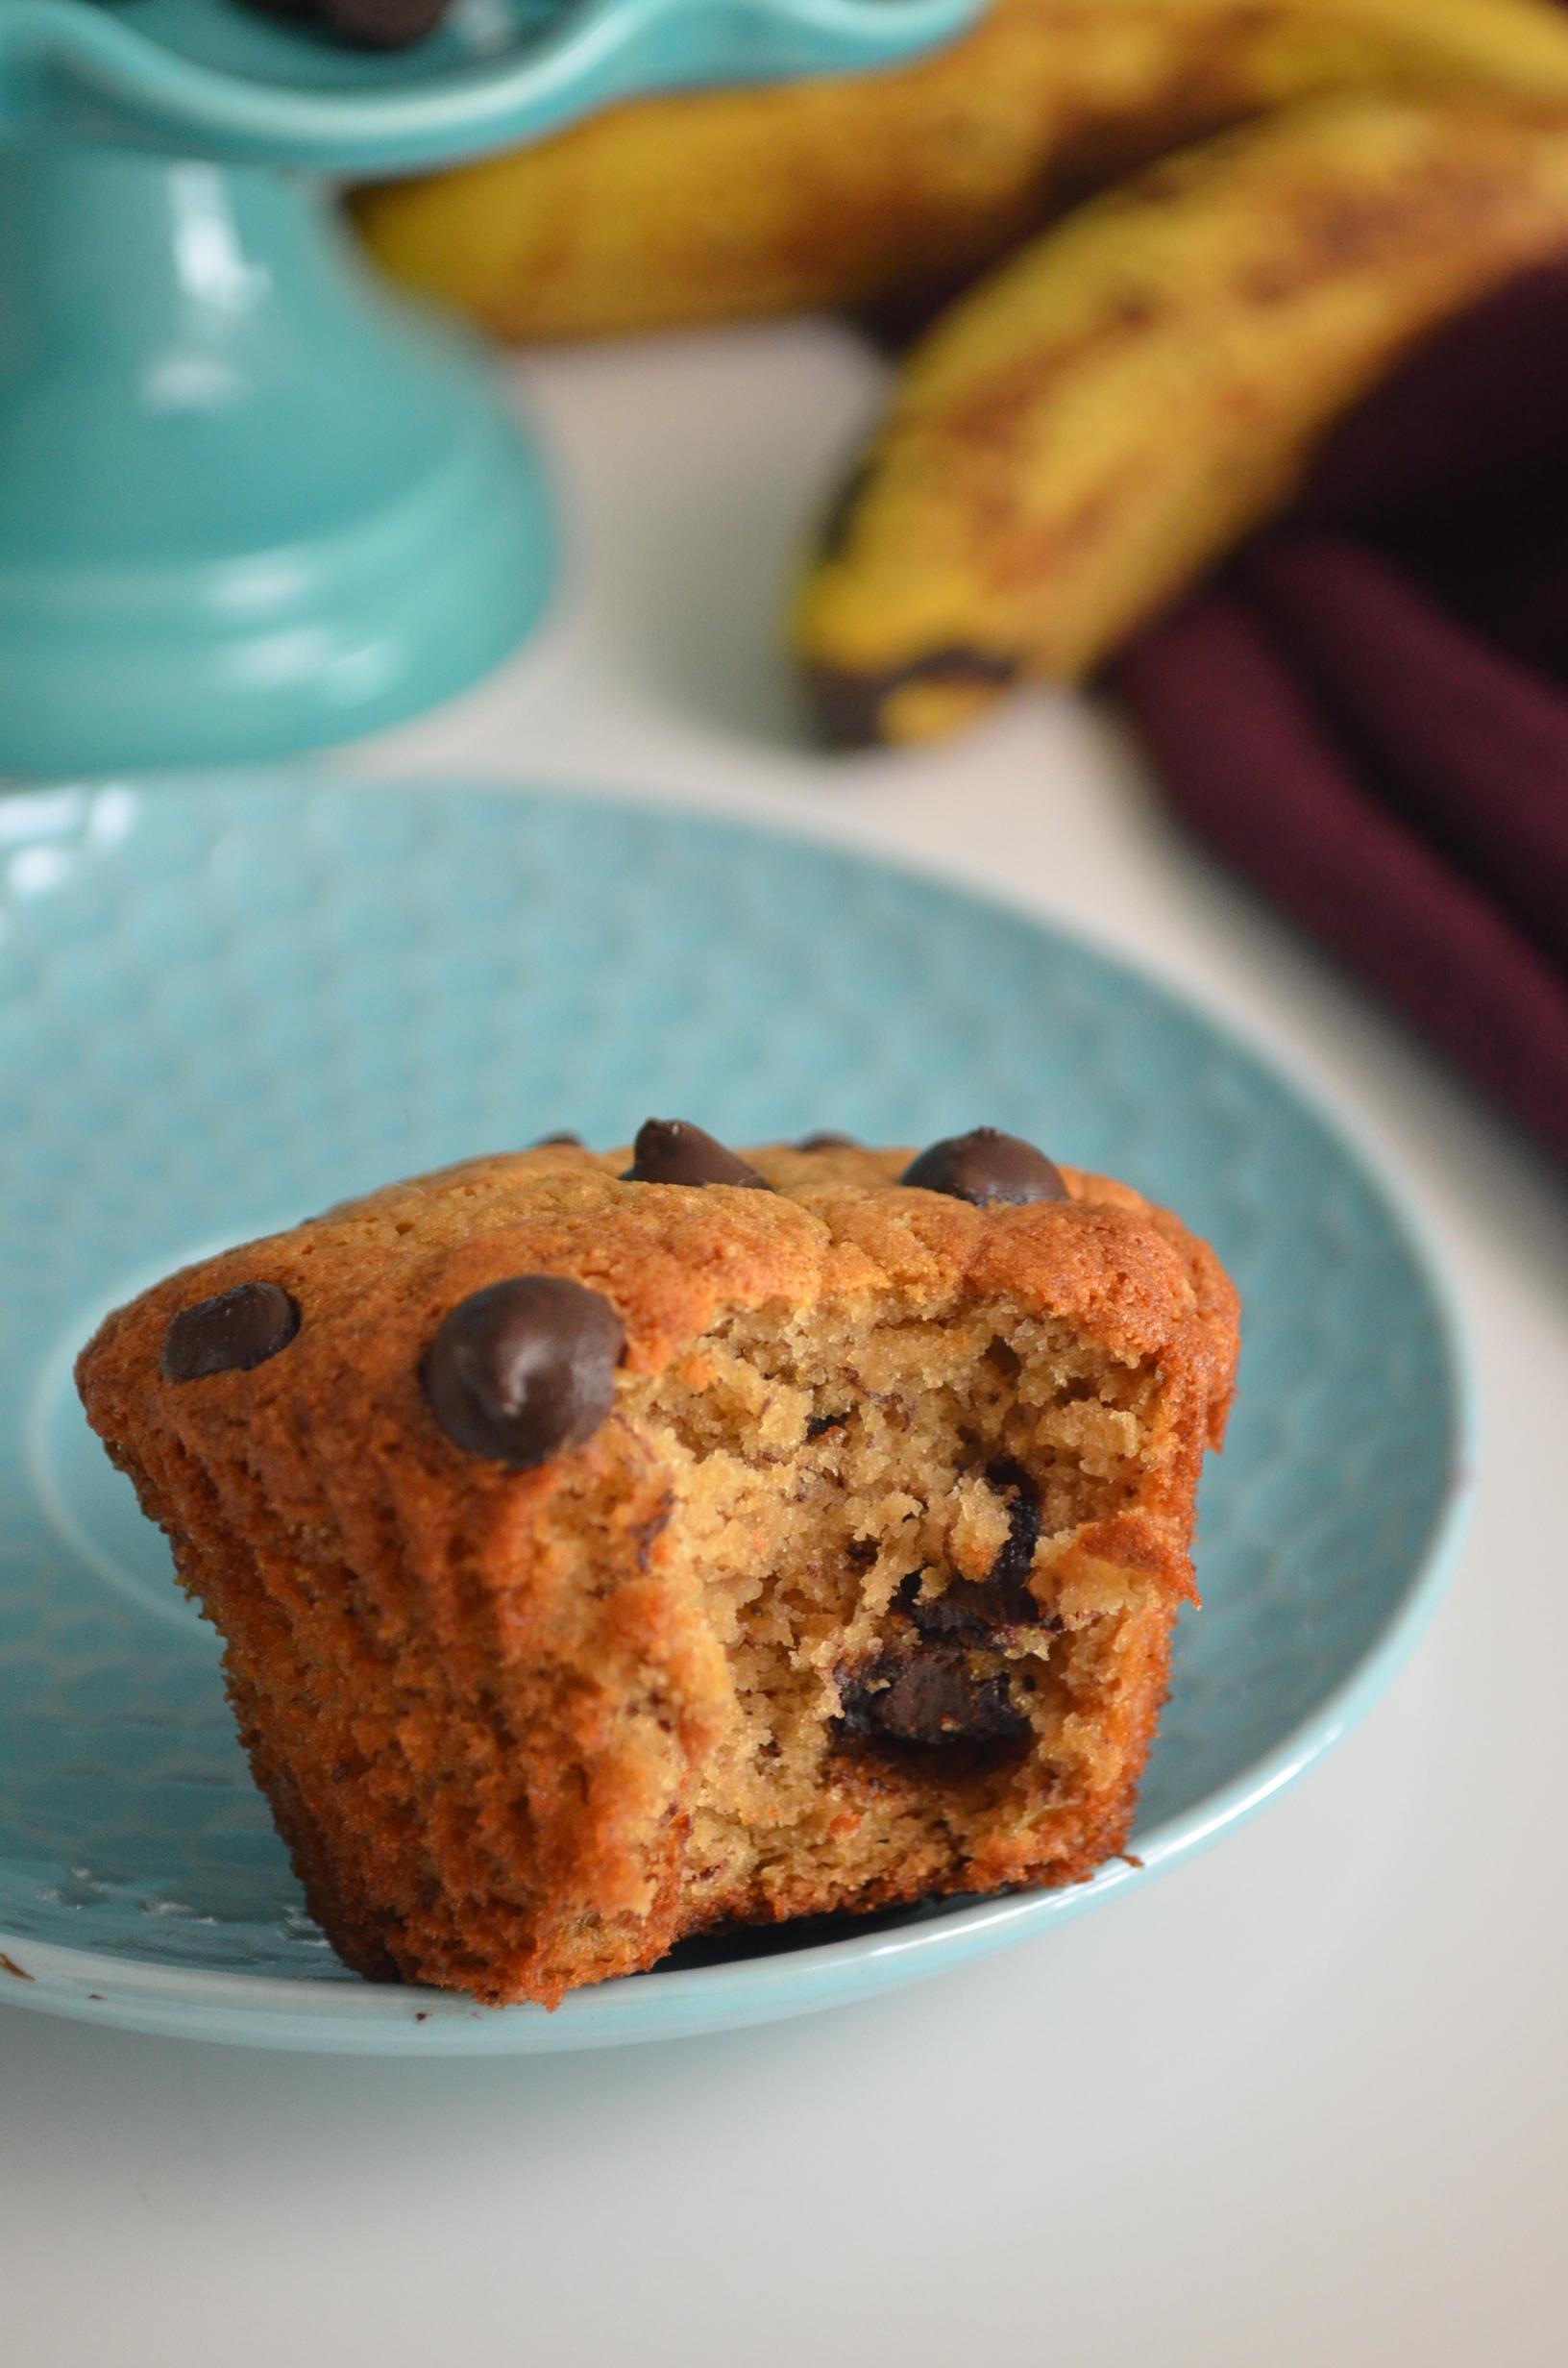 Gluten Free Small Batch Fluffy Banana Chocolate Chip Muffin